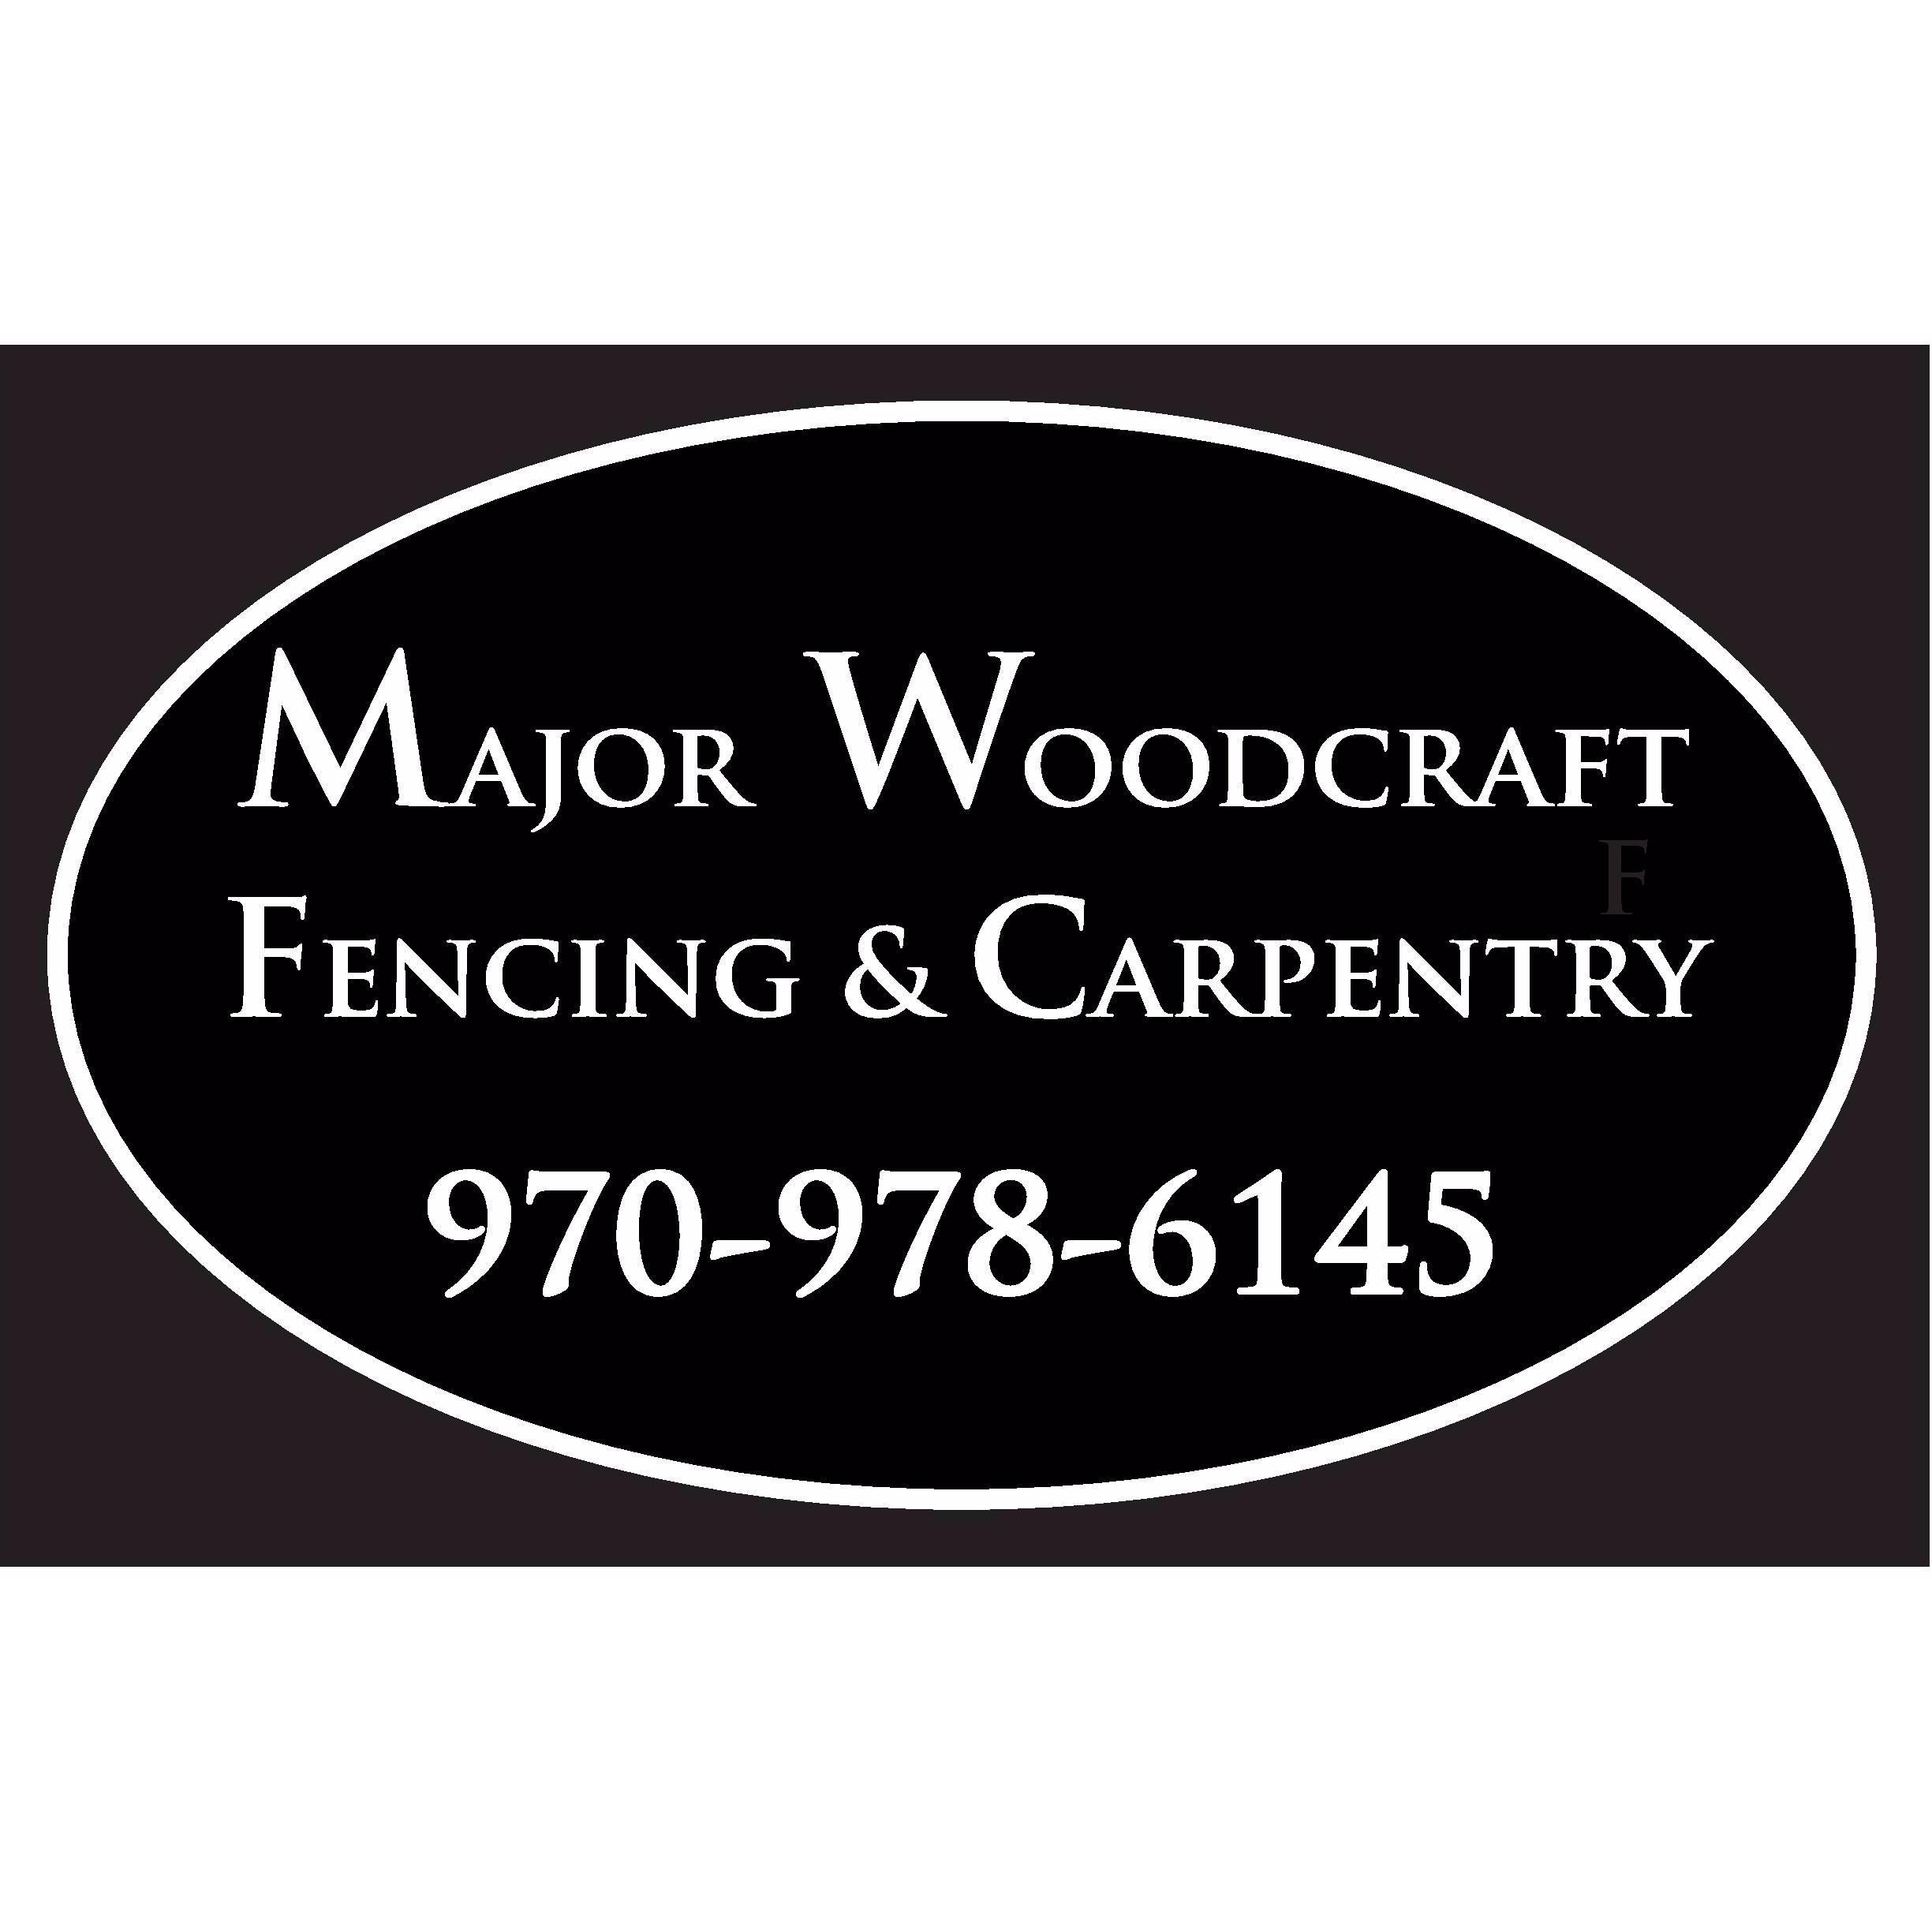 Major Woodcraft